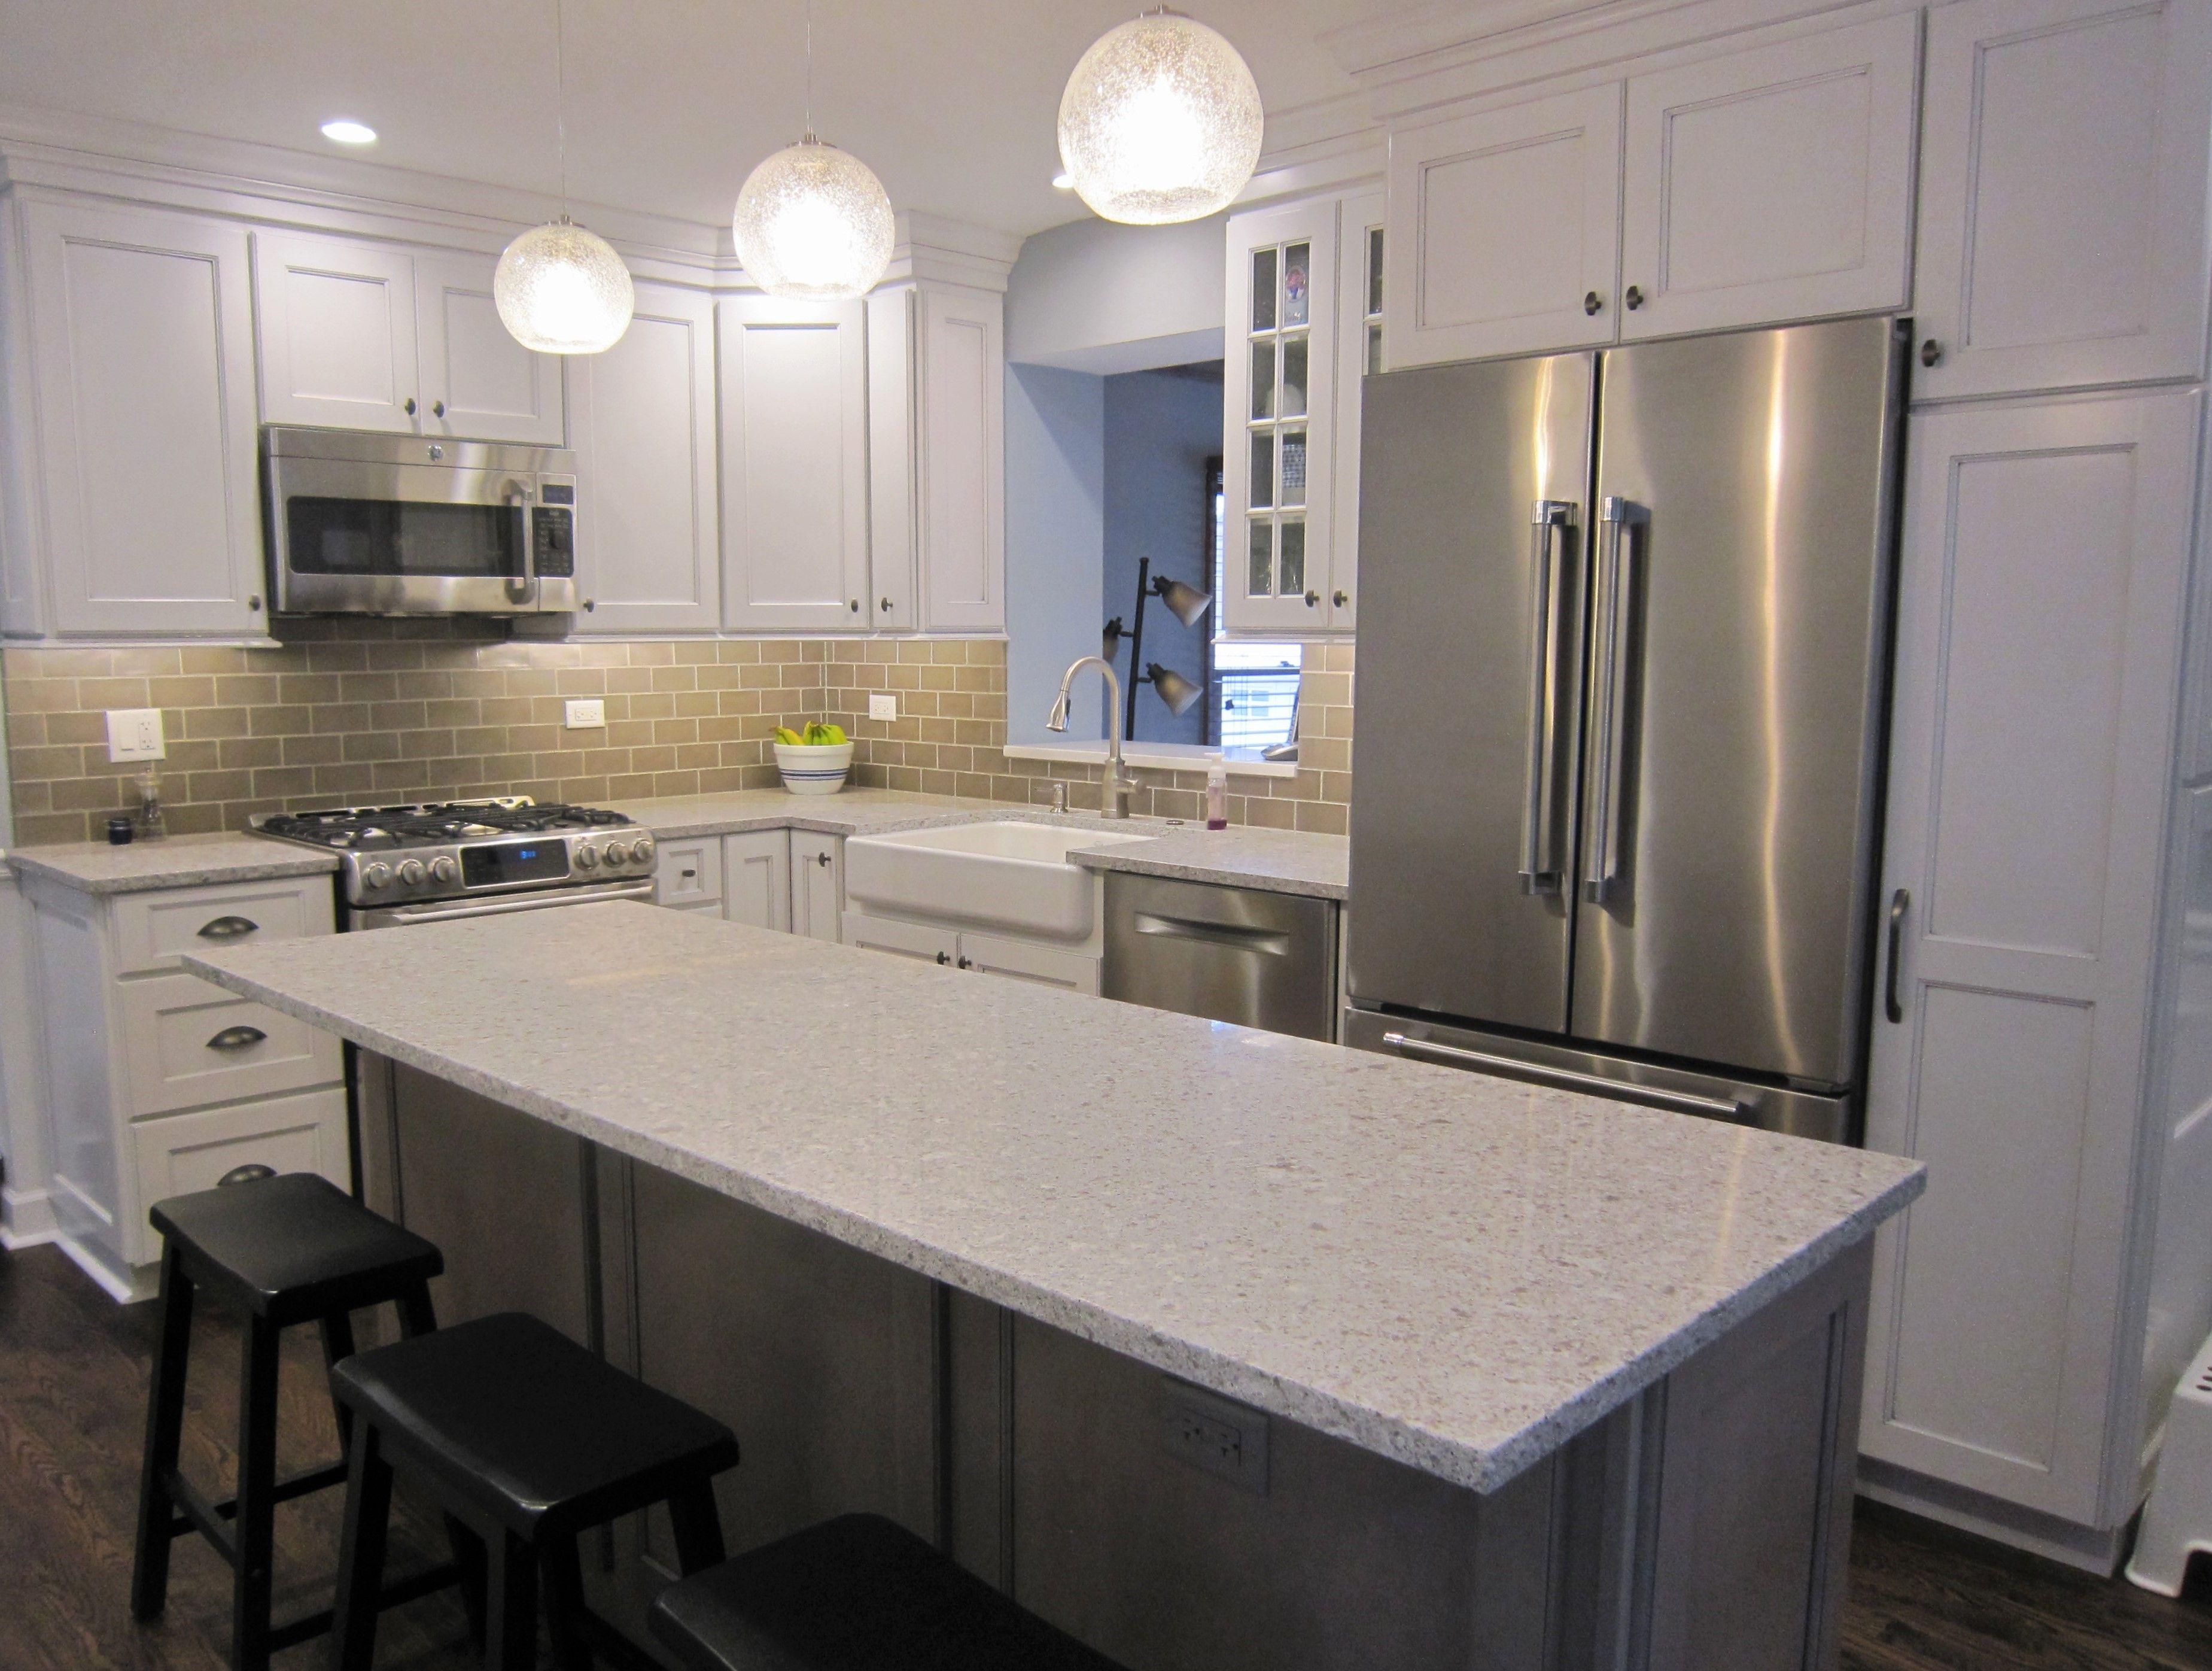 Kitchen Remodel By Premier Design Cabinets Tile Kitchen Remodel Premier Designs Cabinetry